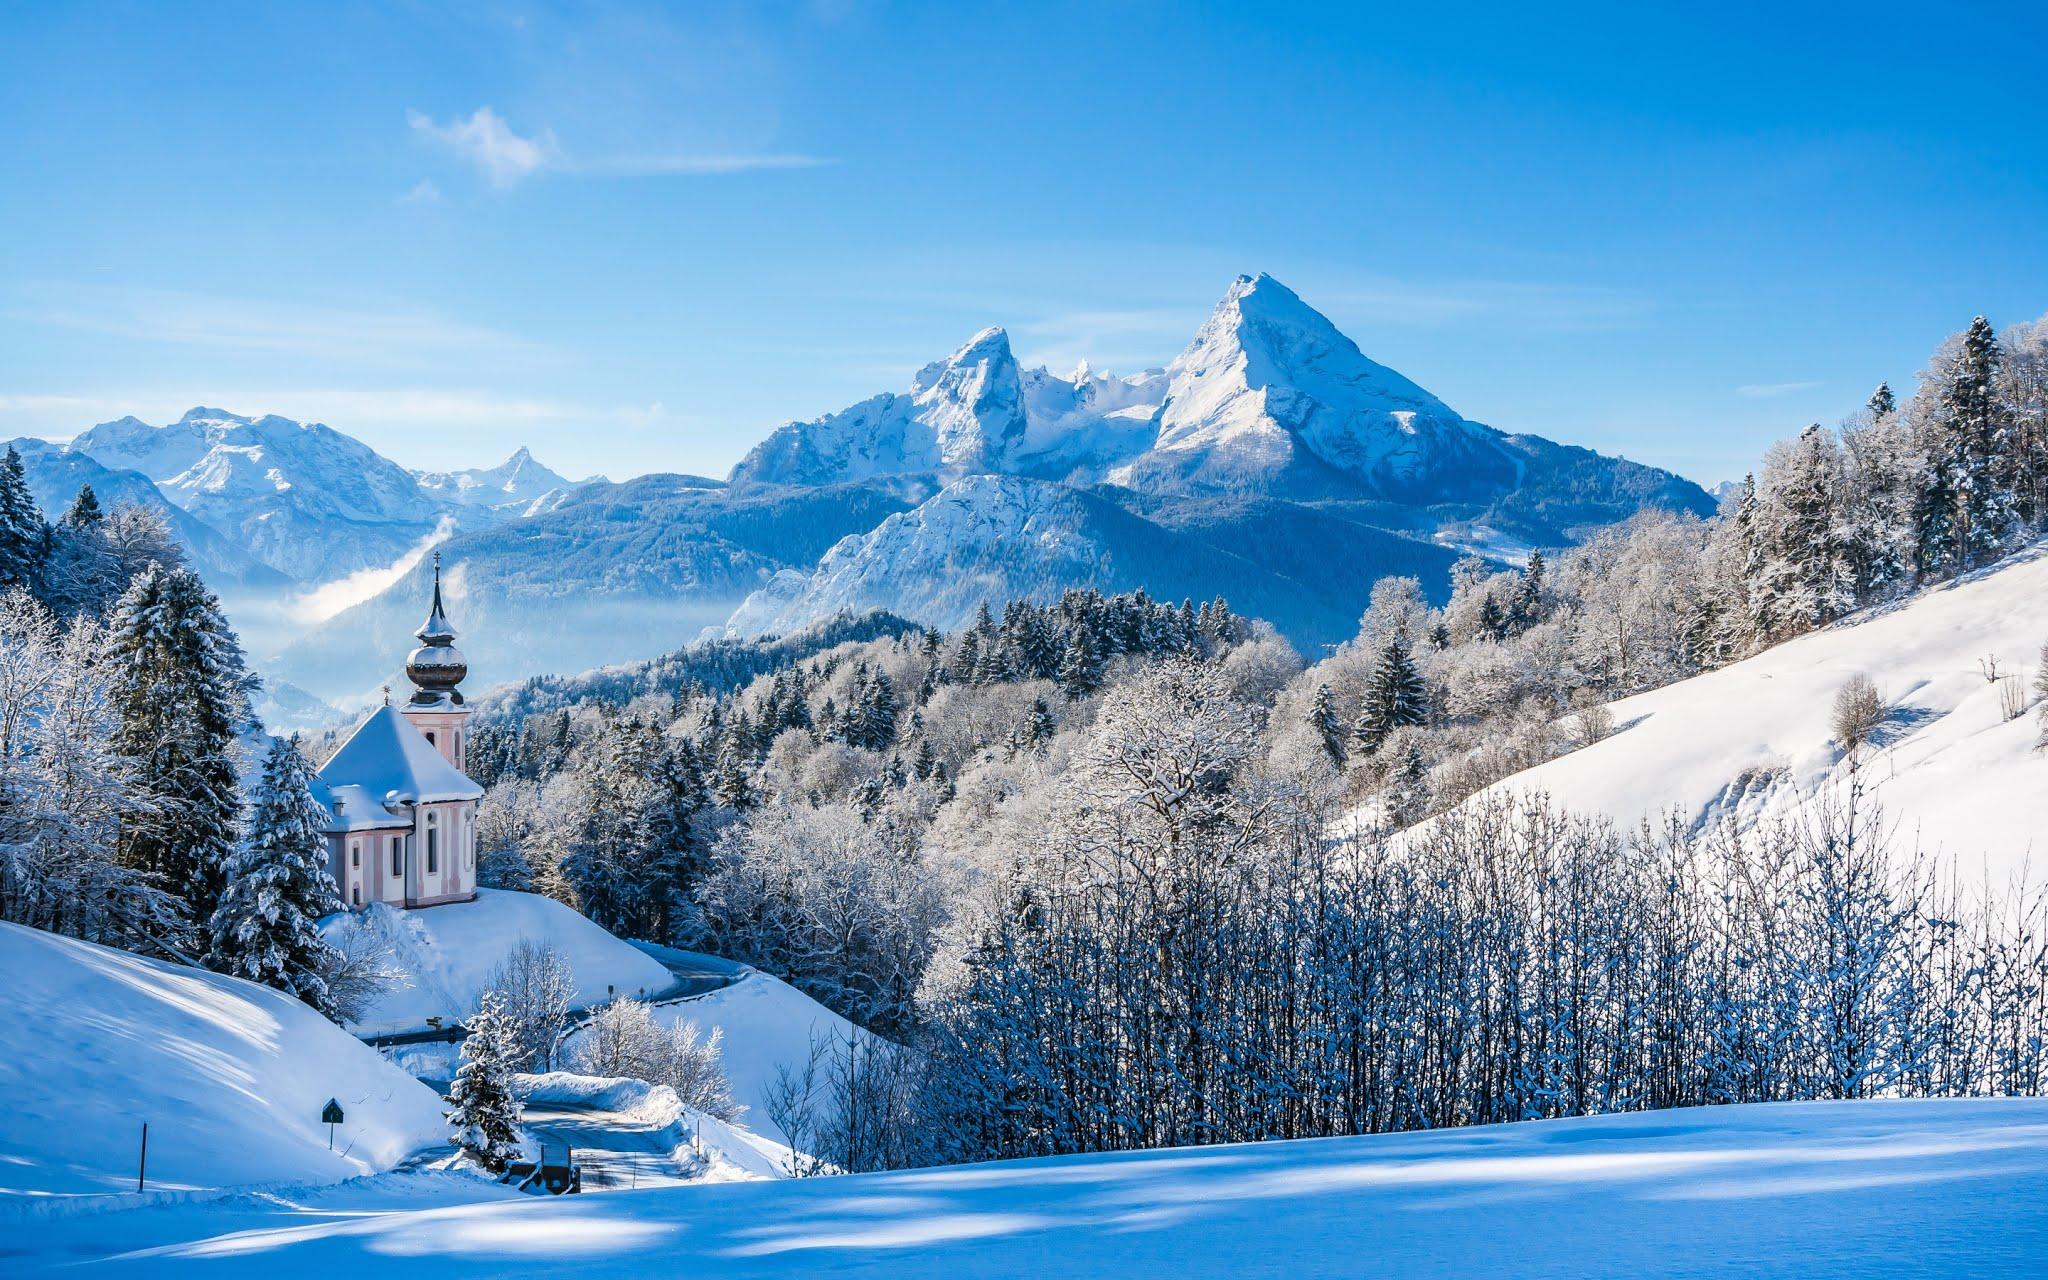 Bavarian Alps Winter Landscape Wallpaper